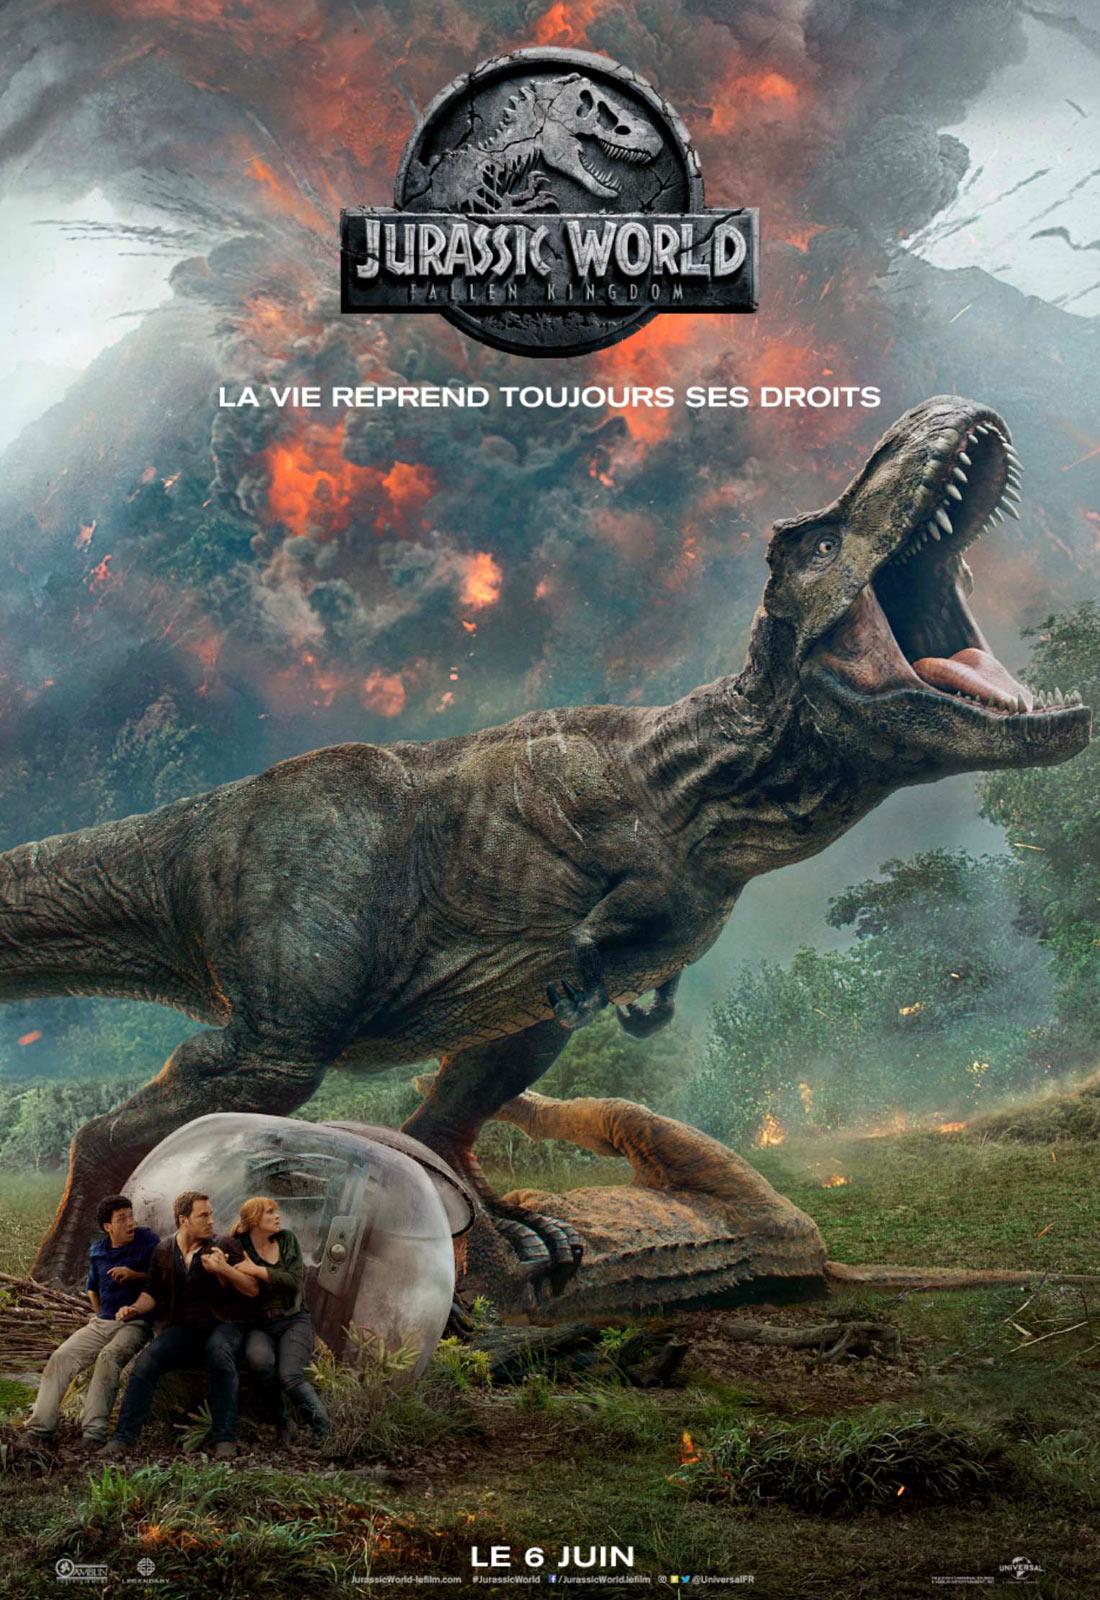 Jurassic world, fallen kingdom: un espoir étouffé dans l'œuf